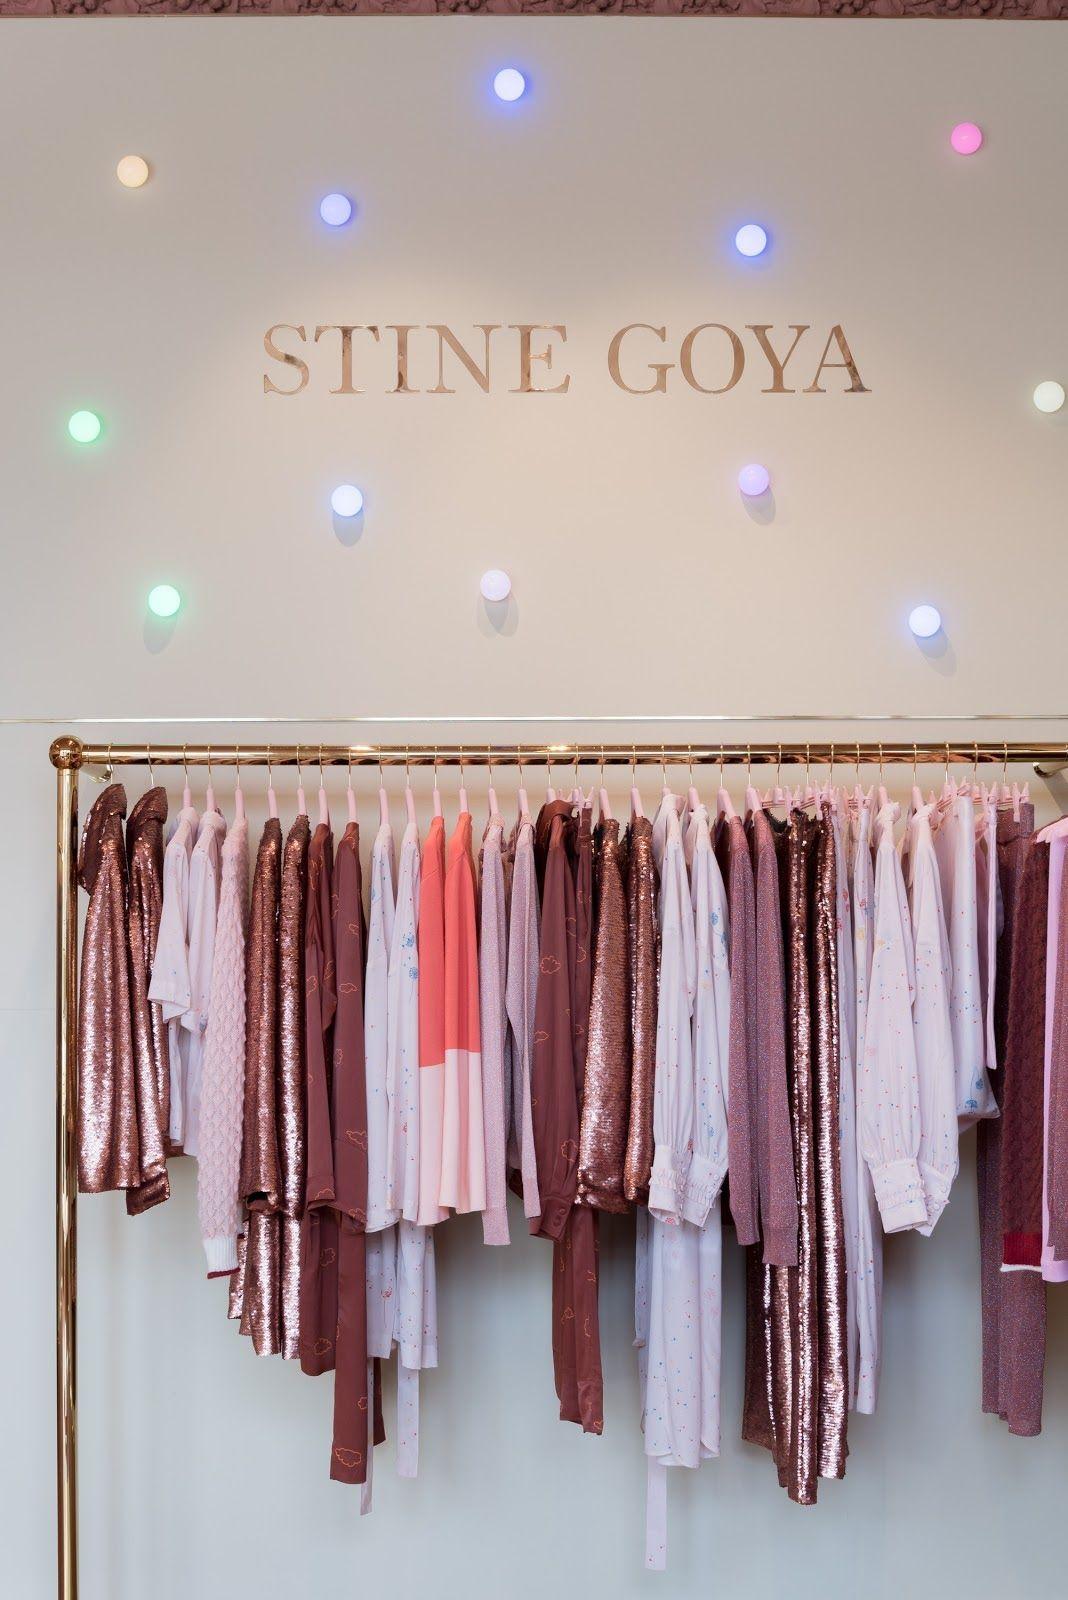 Flagship store for Stine Goya Studio @stinegoyastudio #retaildesign #storedesign #interiordesign #design #danishdesign #copenhagen #stinegoya #fashion